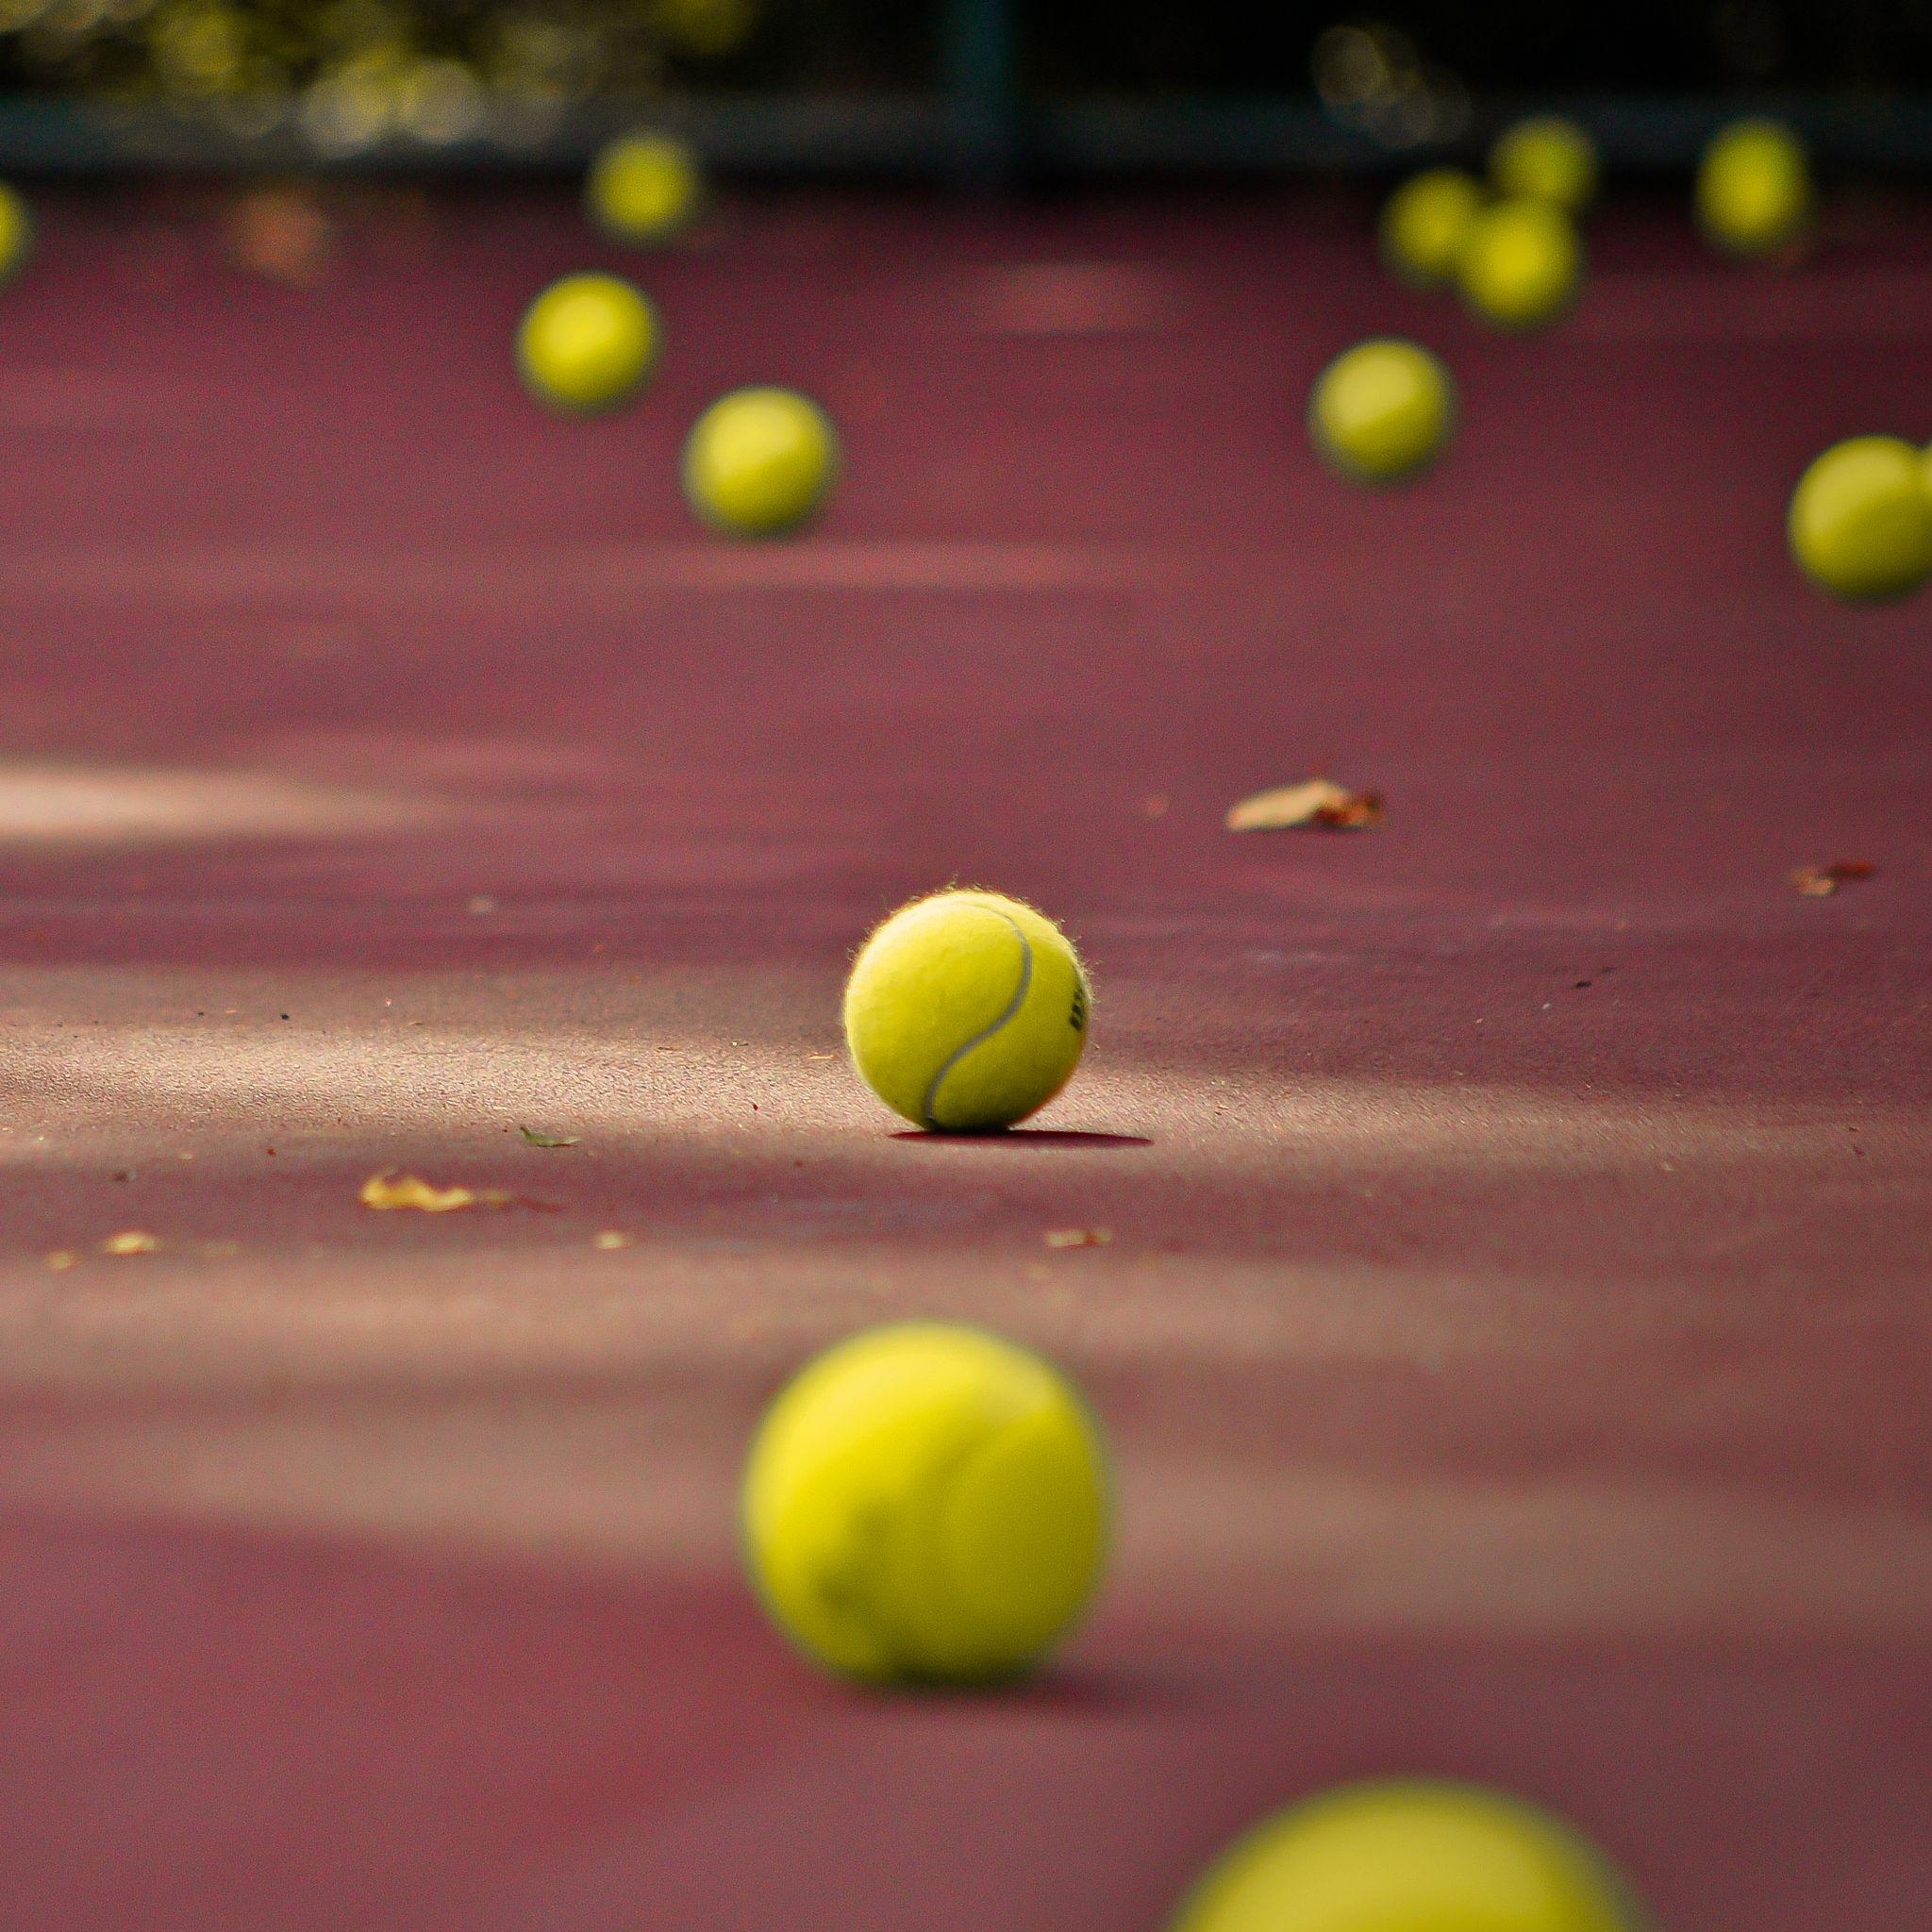 Wallpaper Hd Iphone Tennis Ball Ipad Free Download